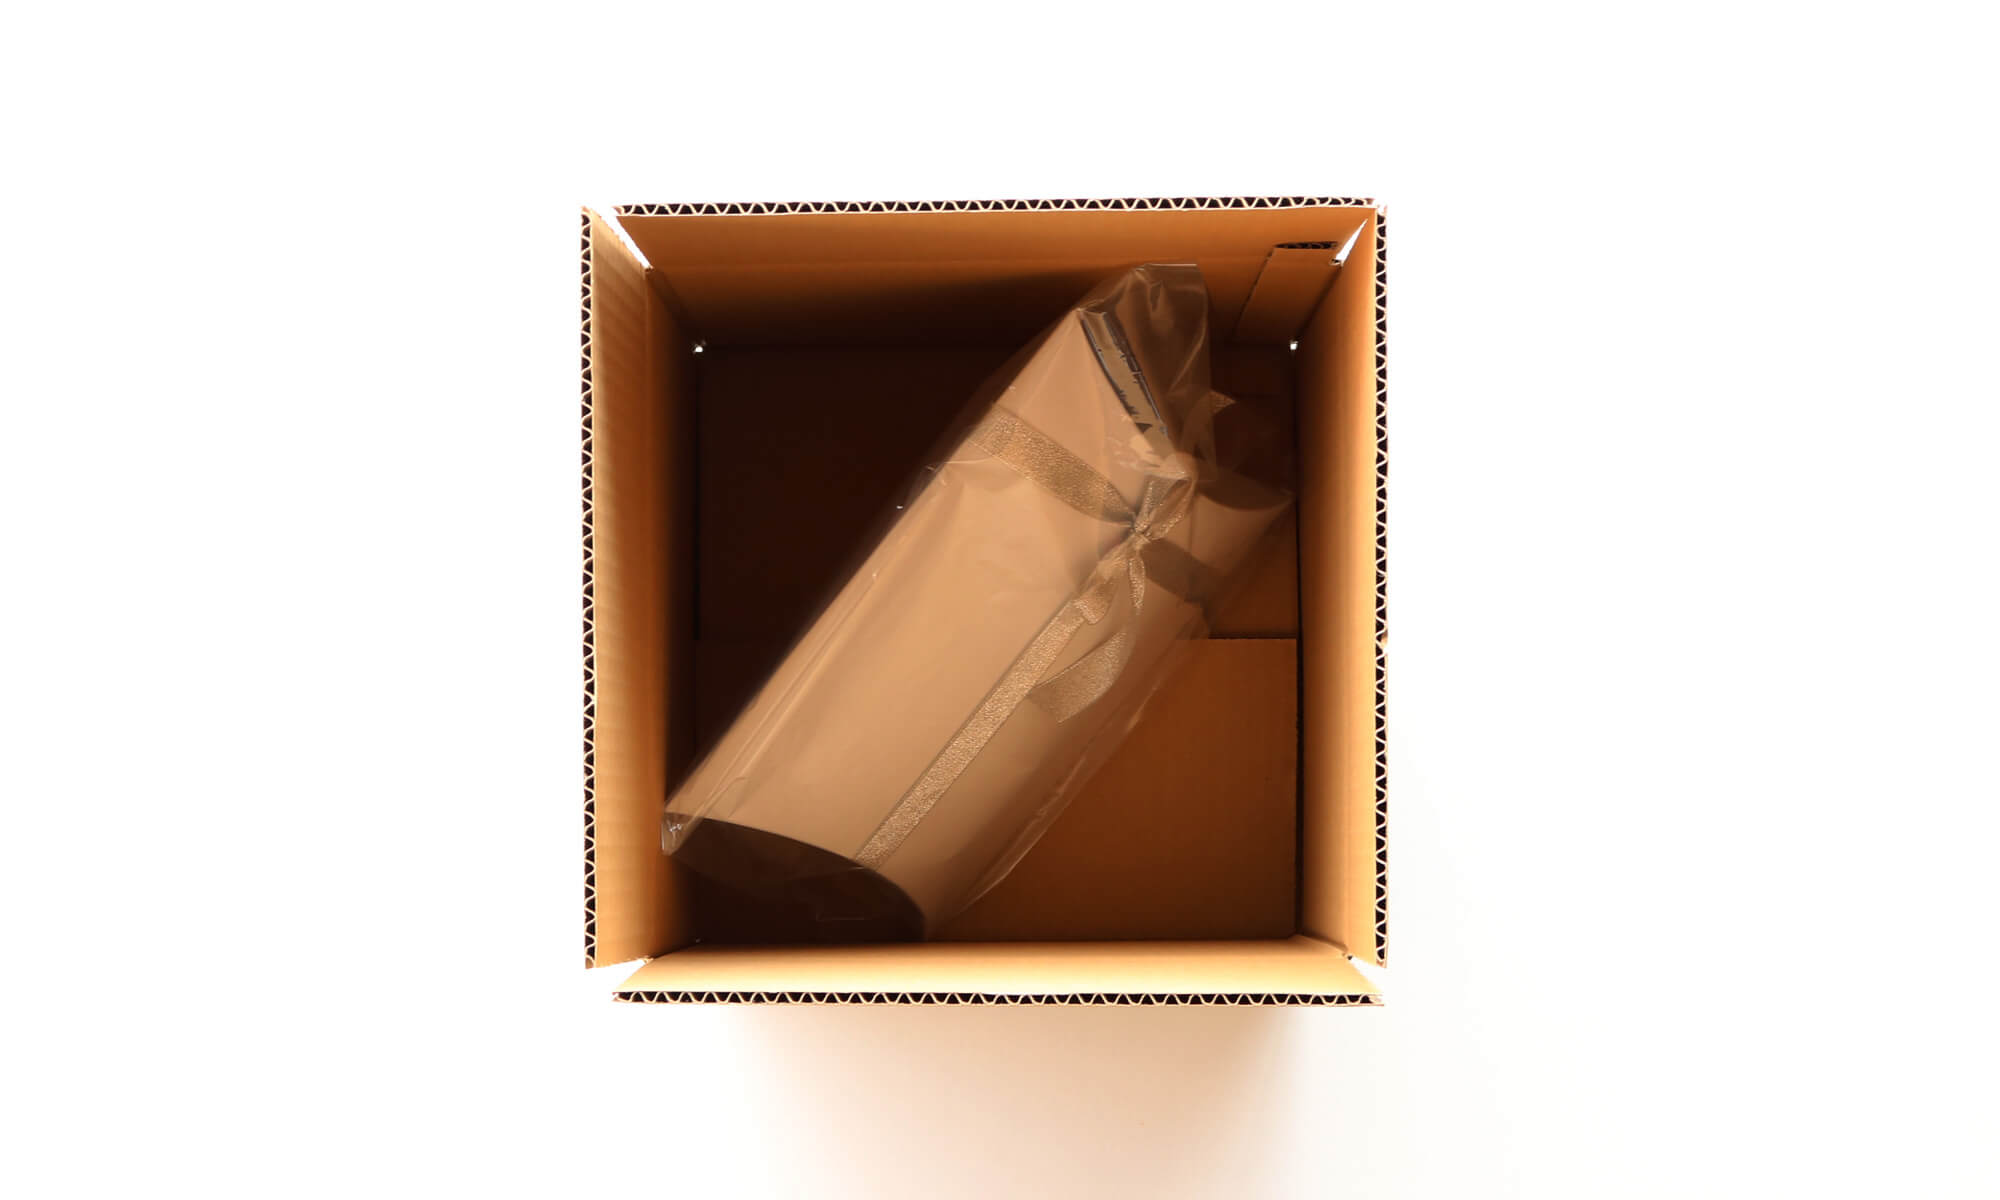 HAVE A GOOD WEEKEND - 当たりつき靴下LUCKY SOCKS(ラッキーソックス)の公式通販のラッピング画像014